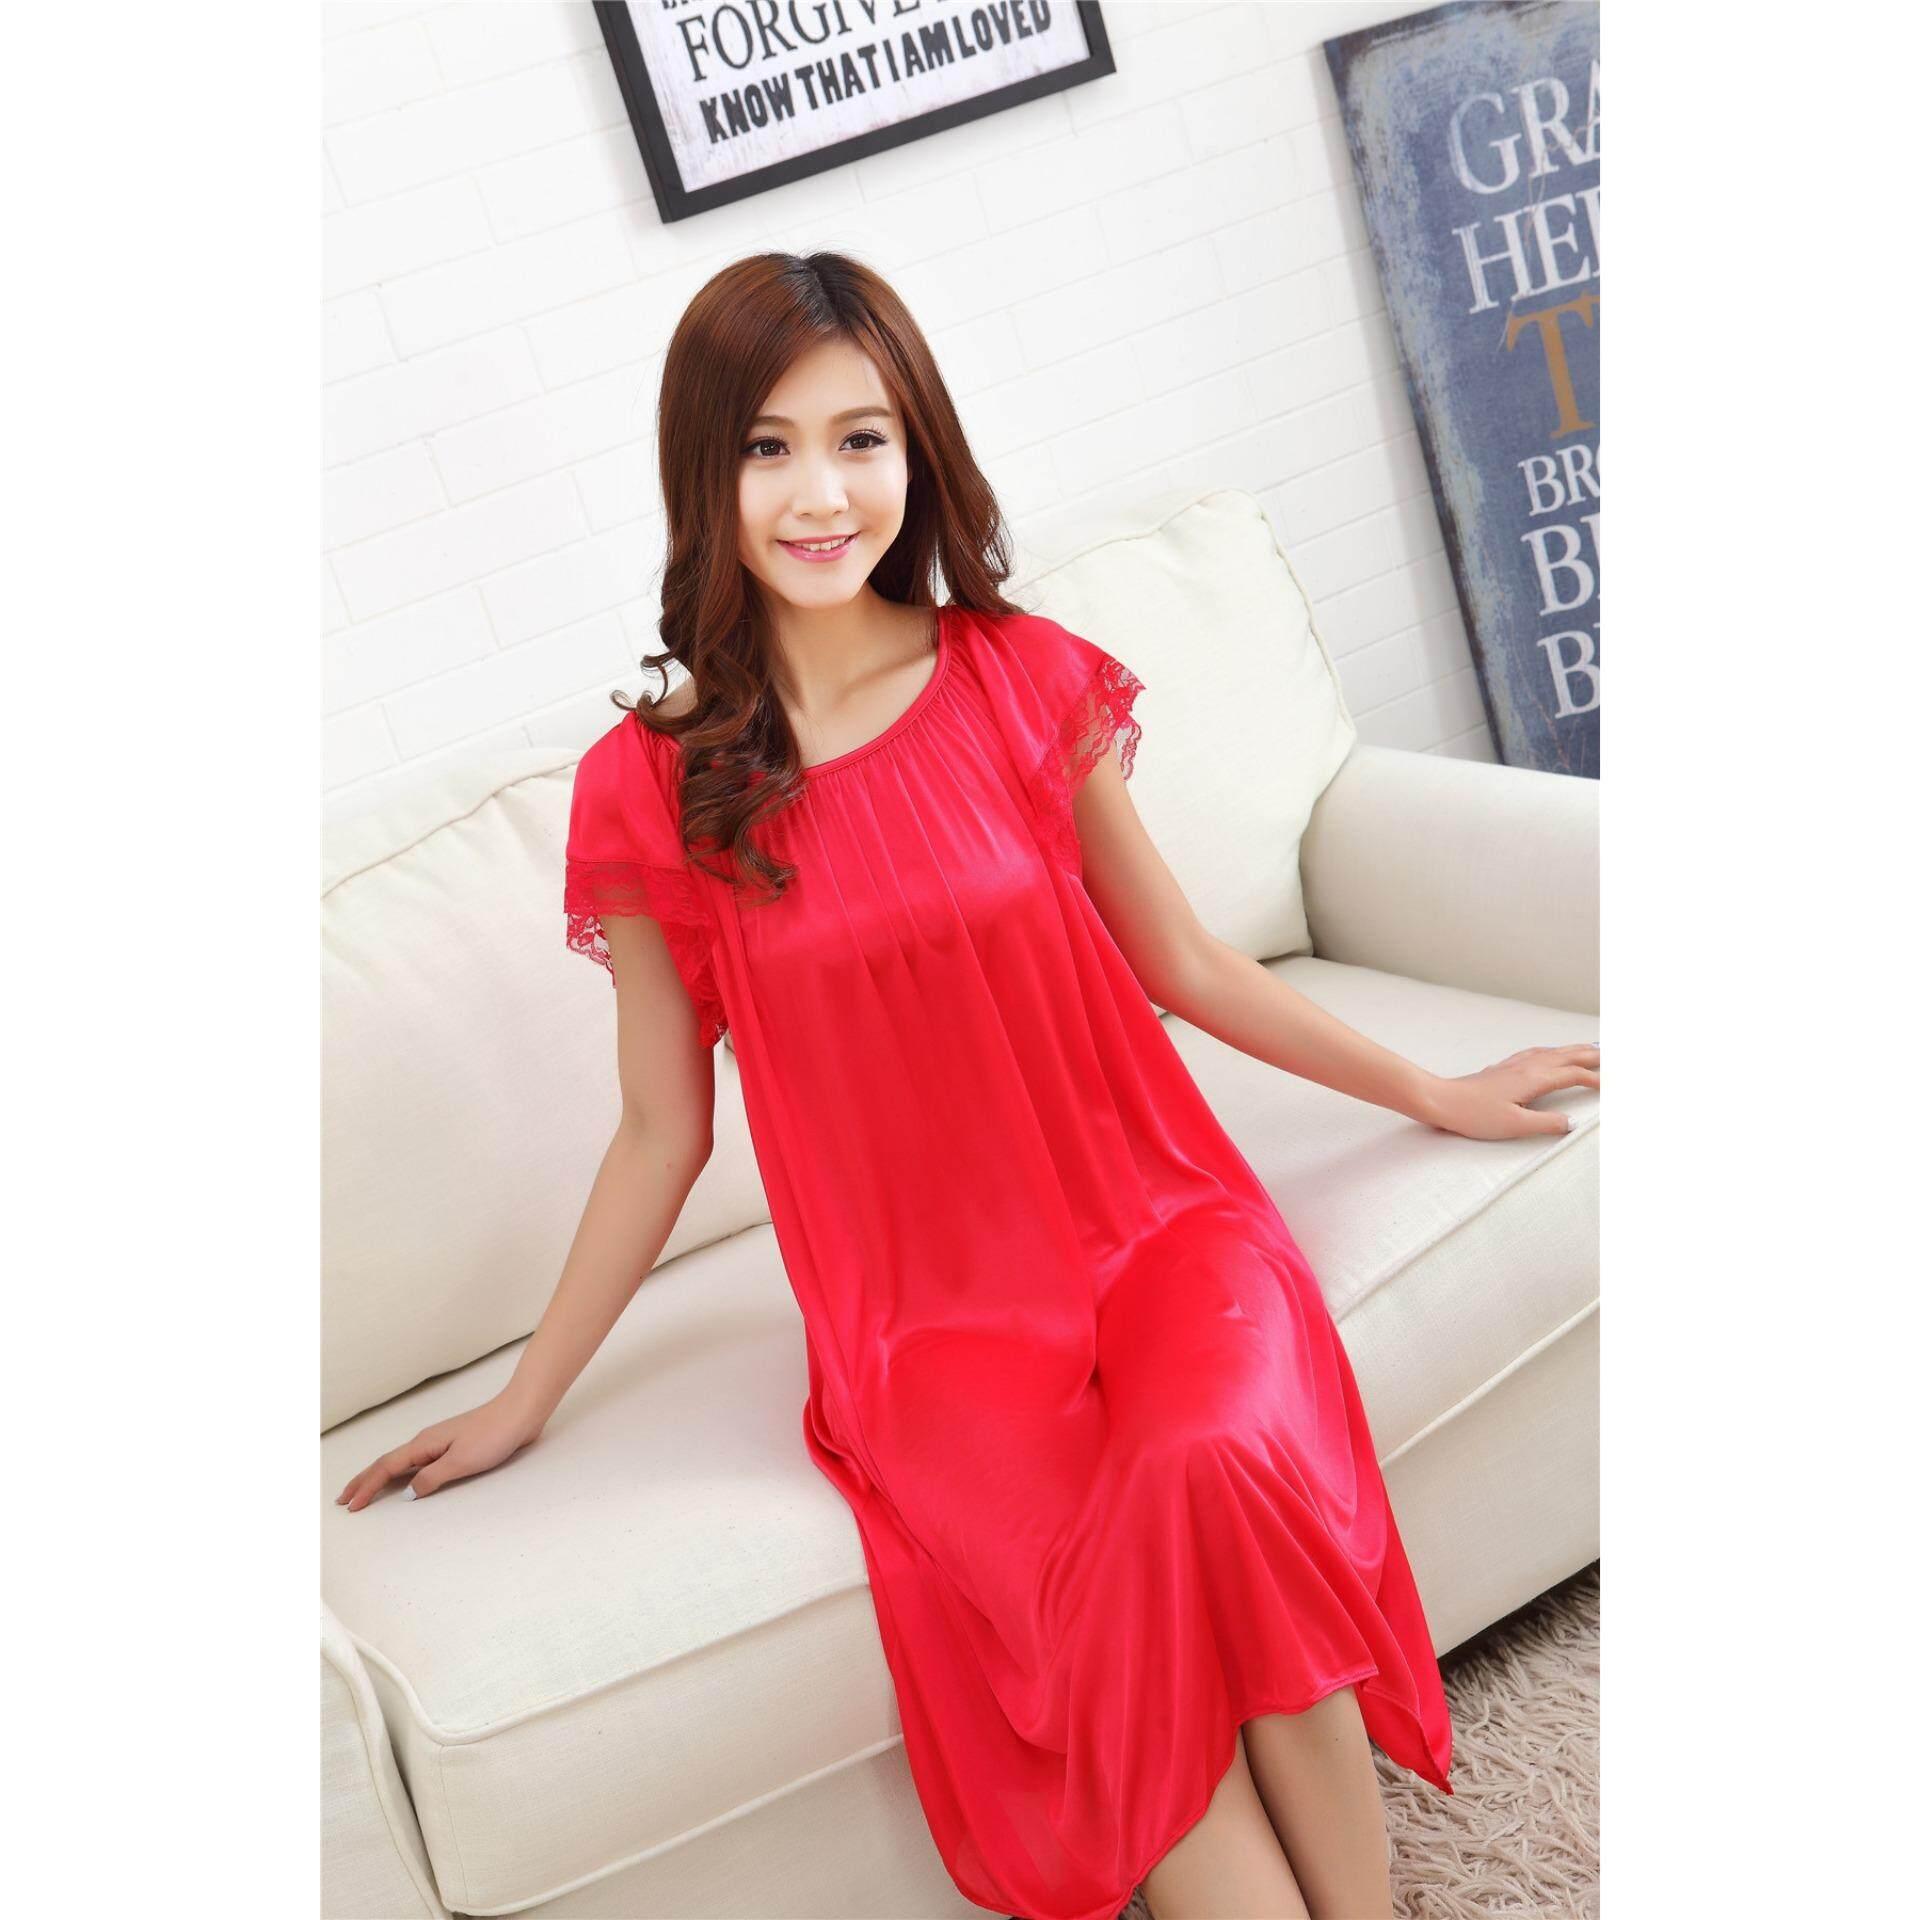 7f550efc2 Bolster Store Ladies Women Sleepwear Sexy Lingerie Basic Plain ...